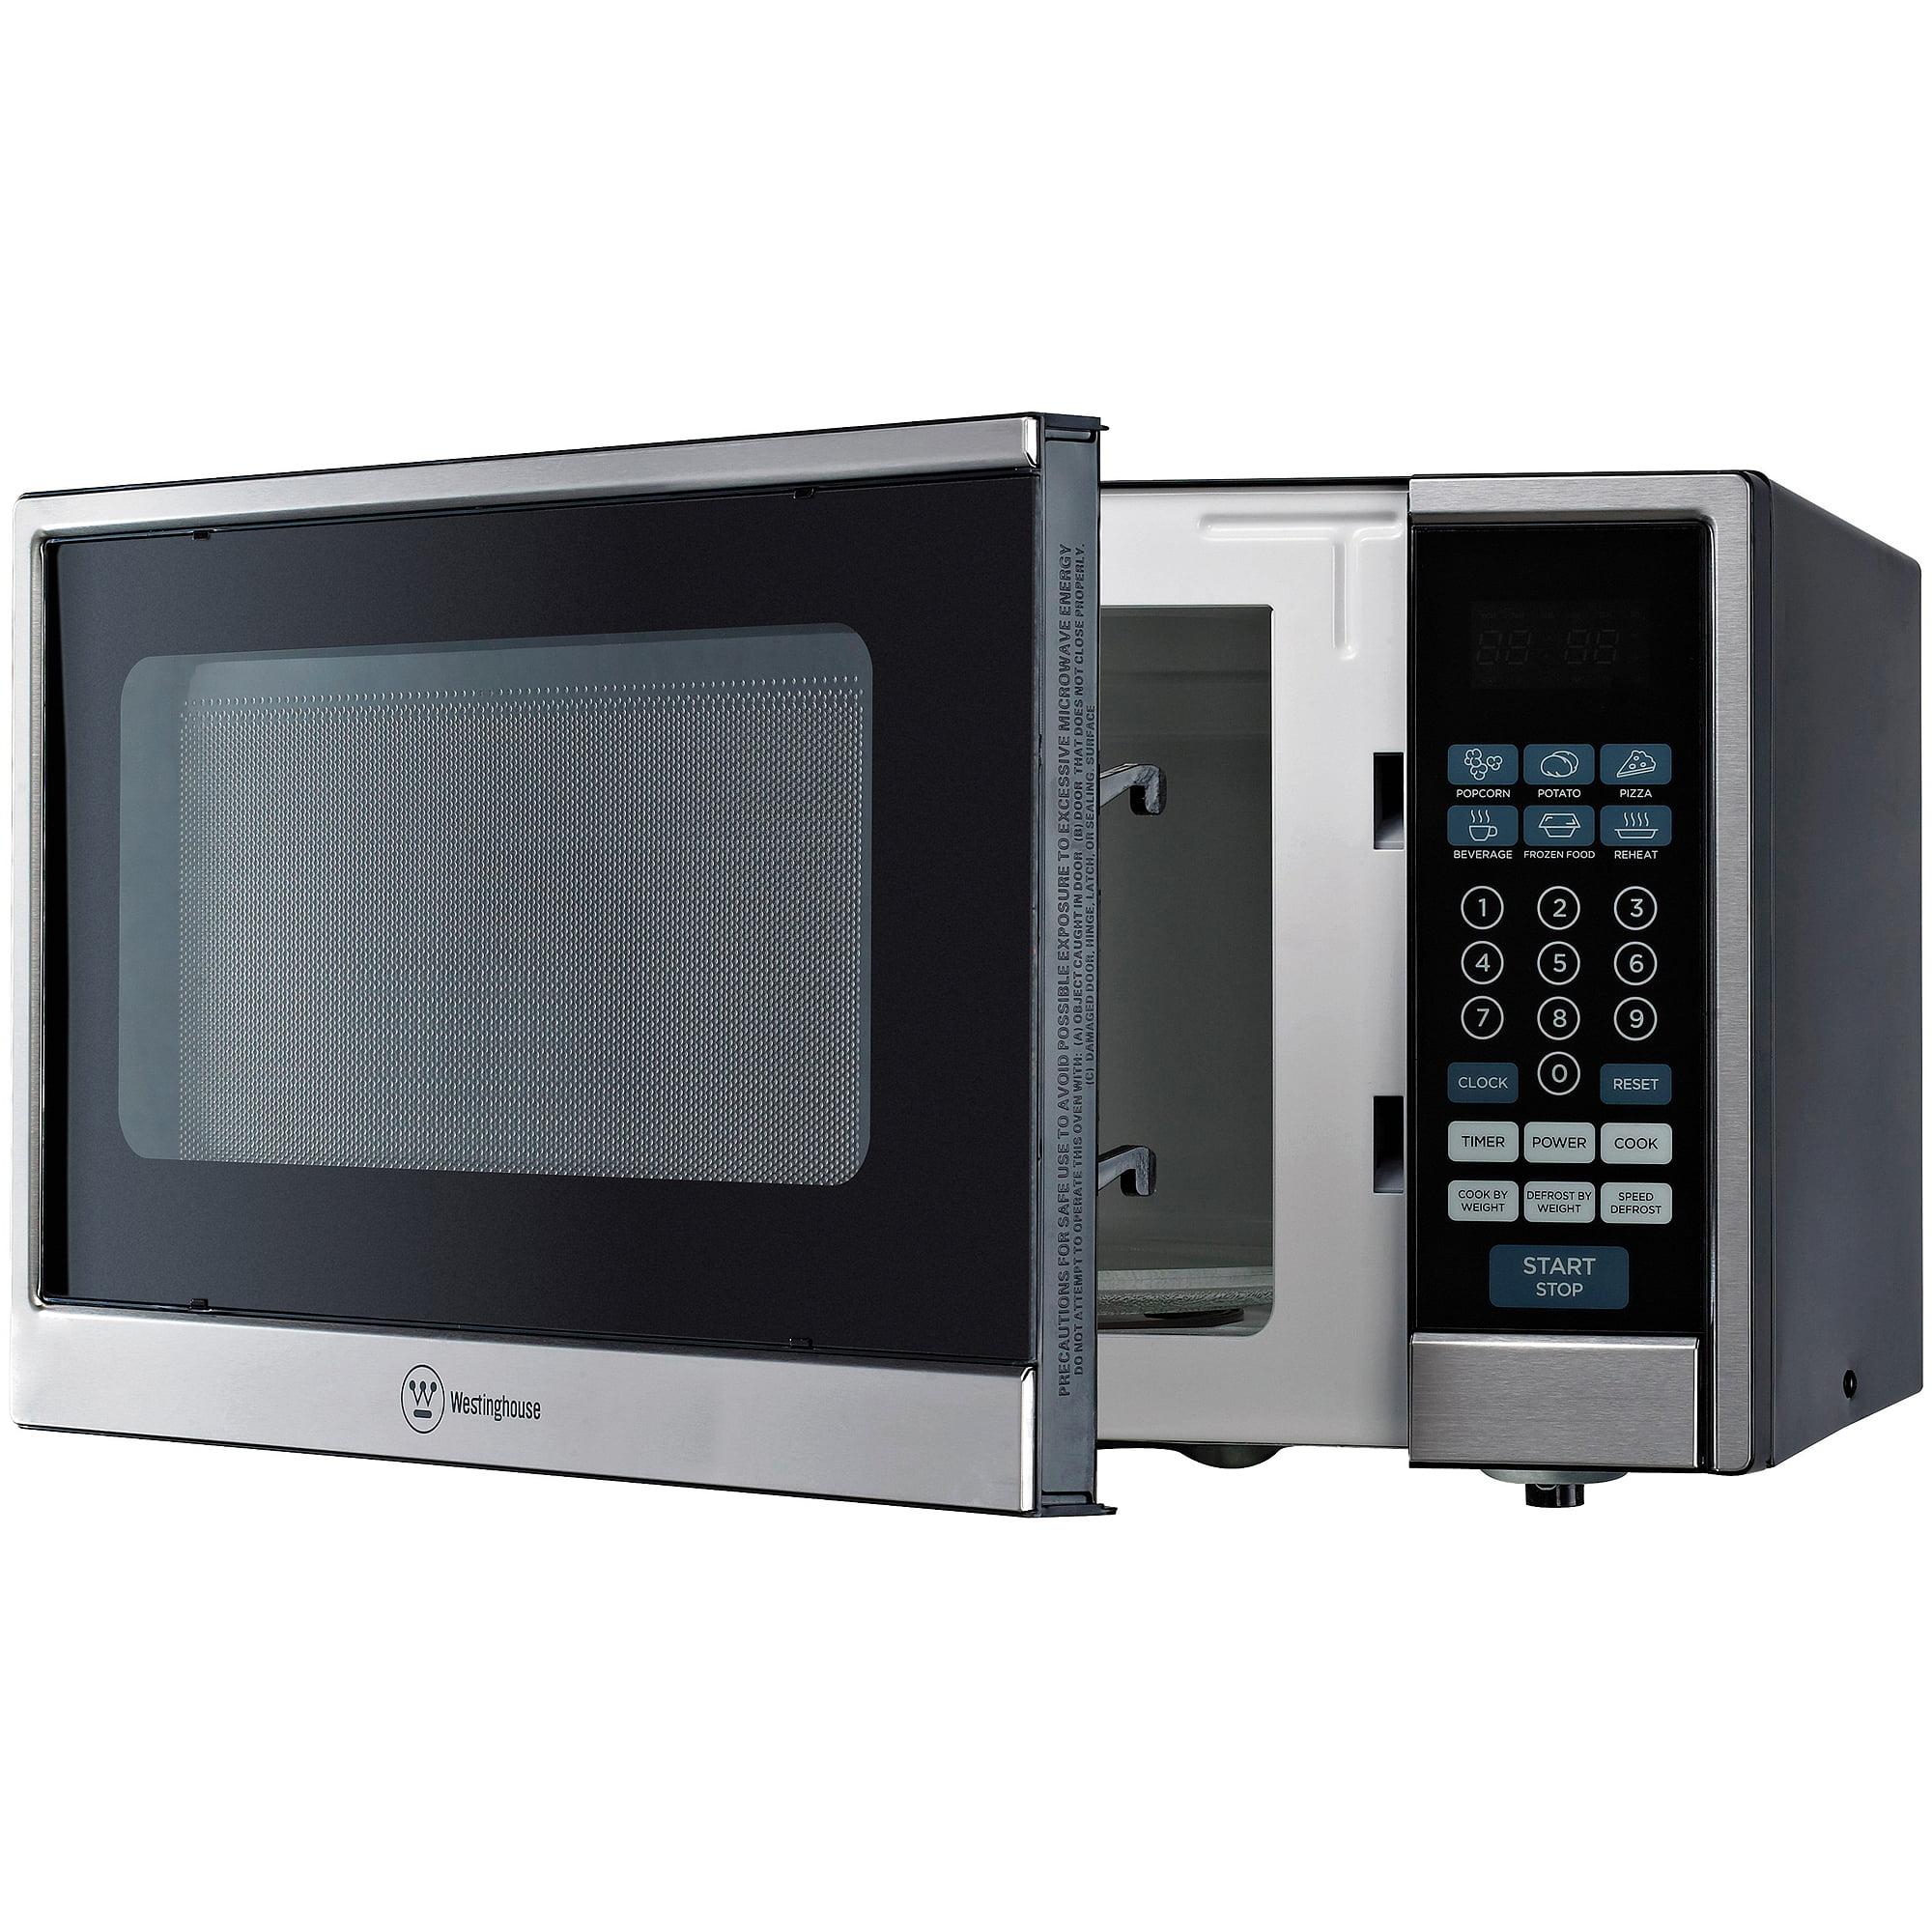 Westinghouse 1 Cu Ft 1000w Countertop Microwave Black Stainless Steel